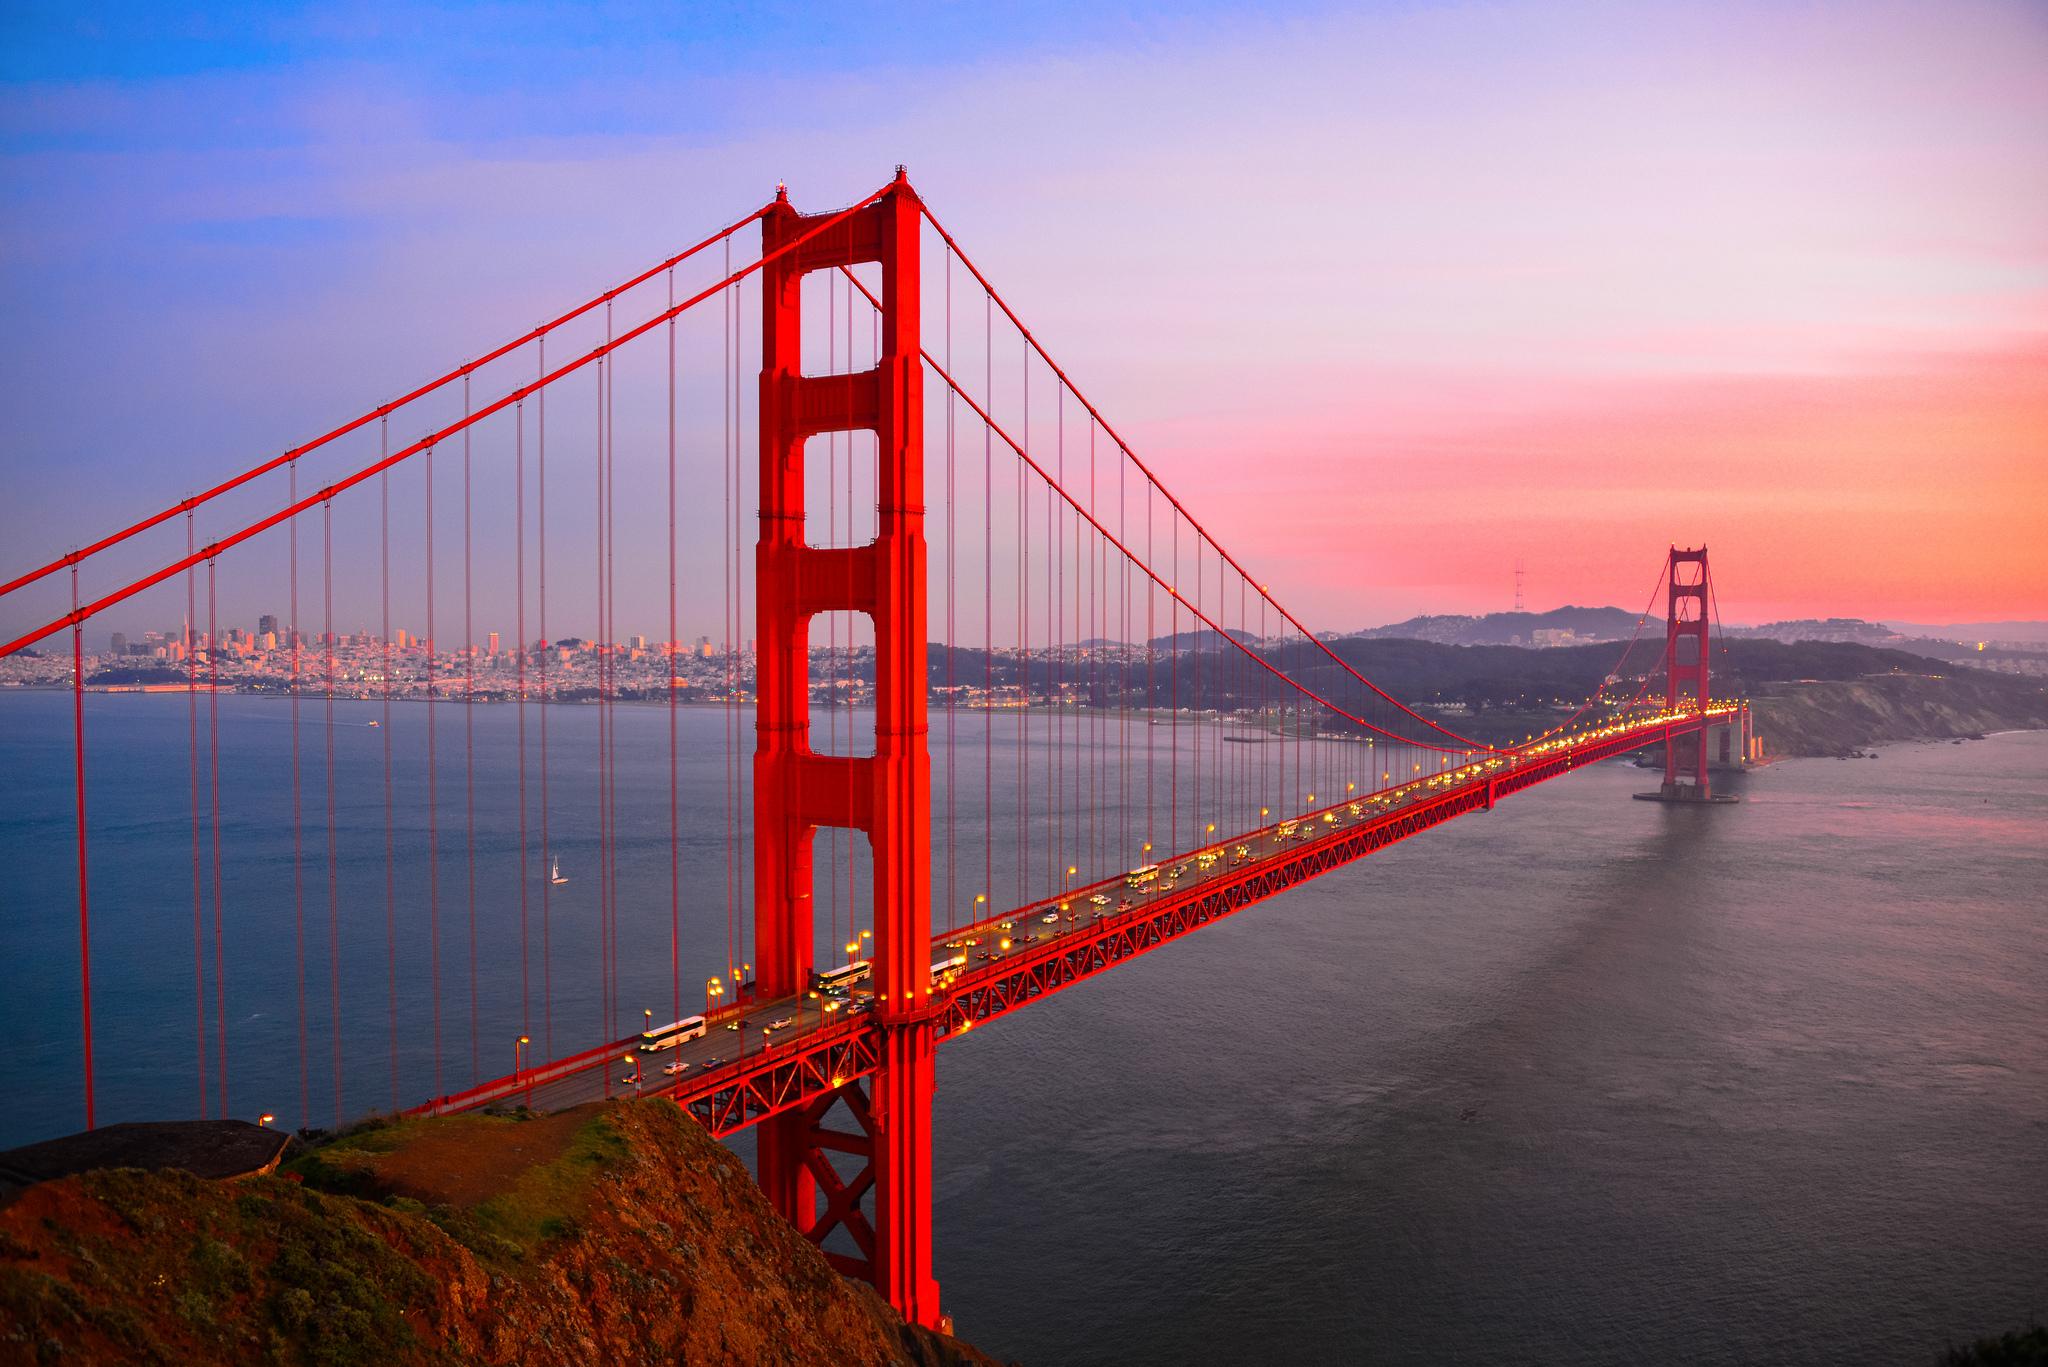 Evening Crossing, Bay Bridge, San Francisco, California  № 3721021  скачать